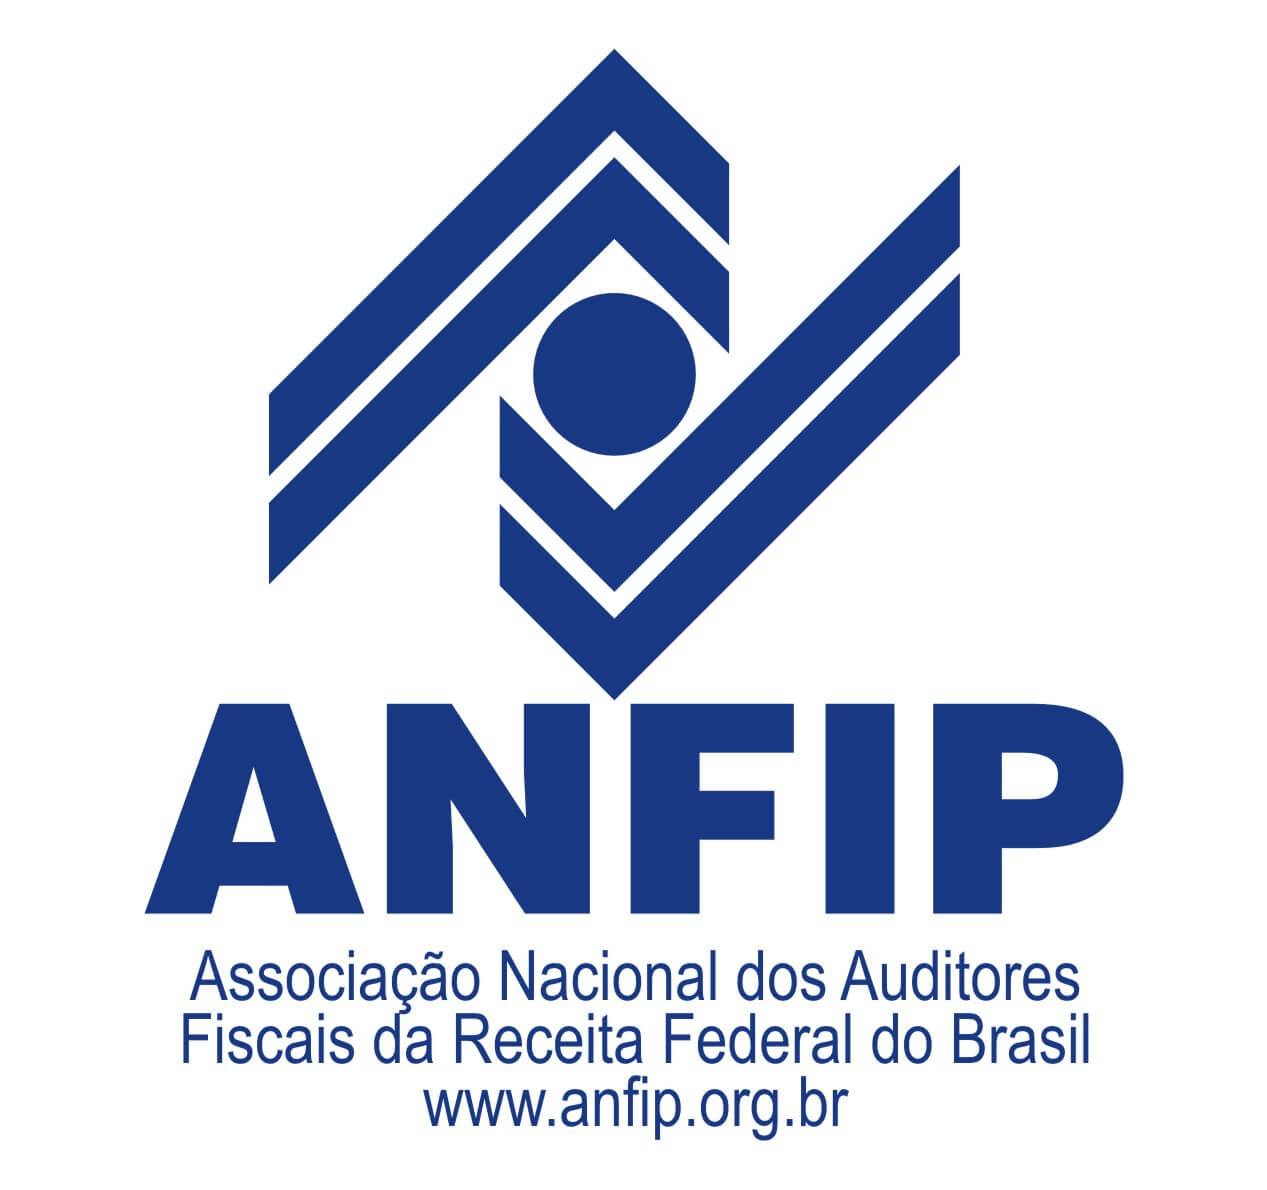 Anfip